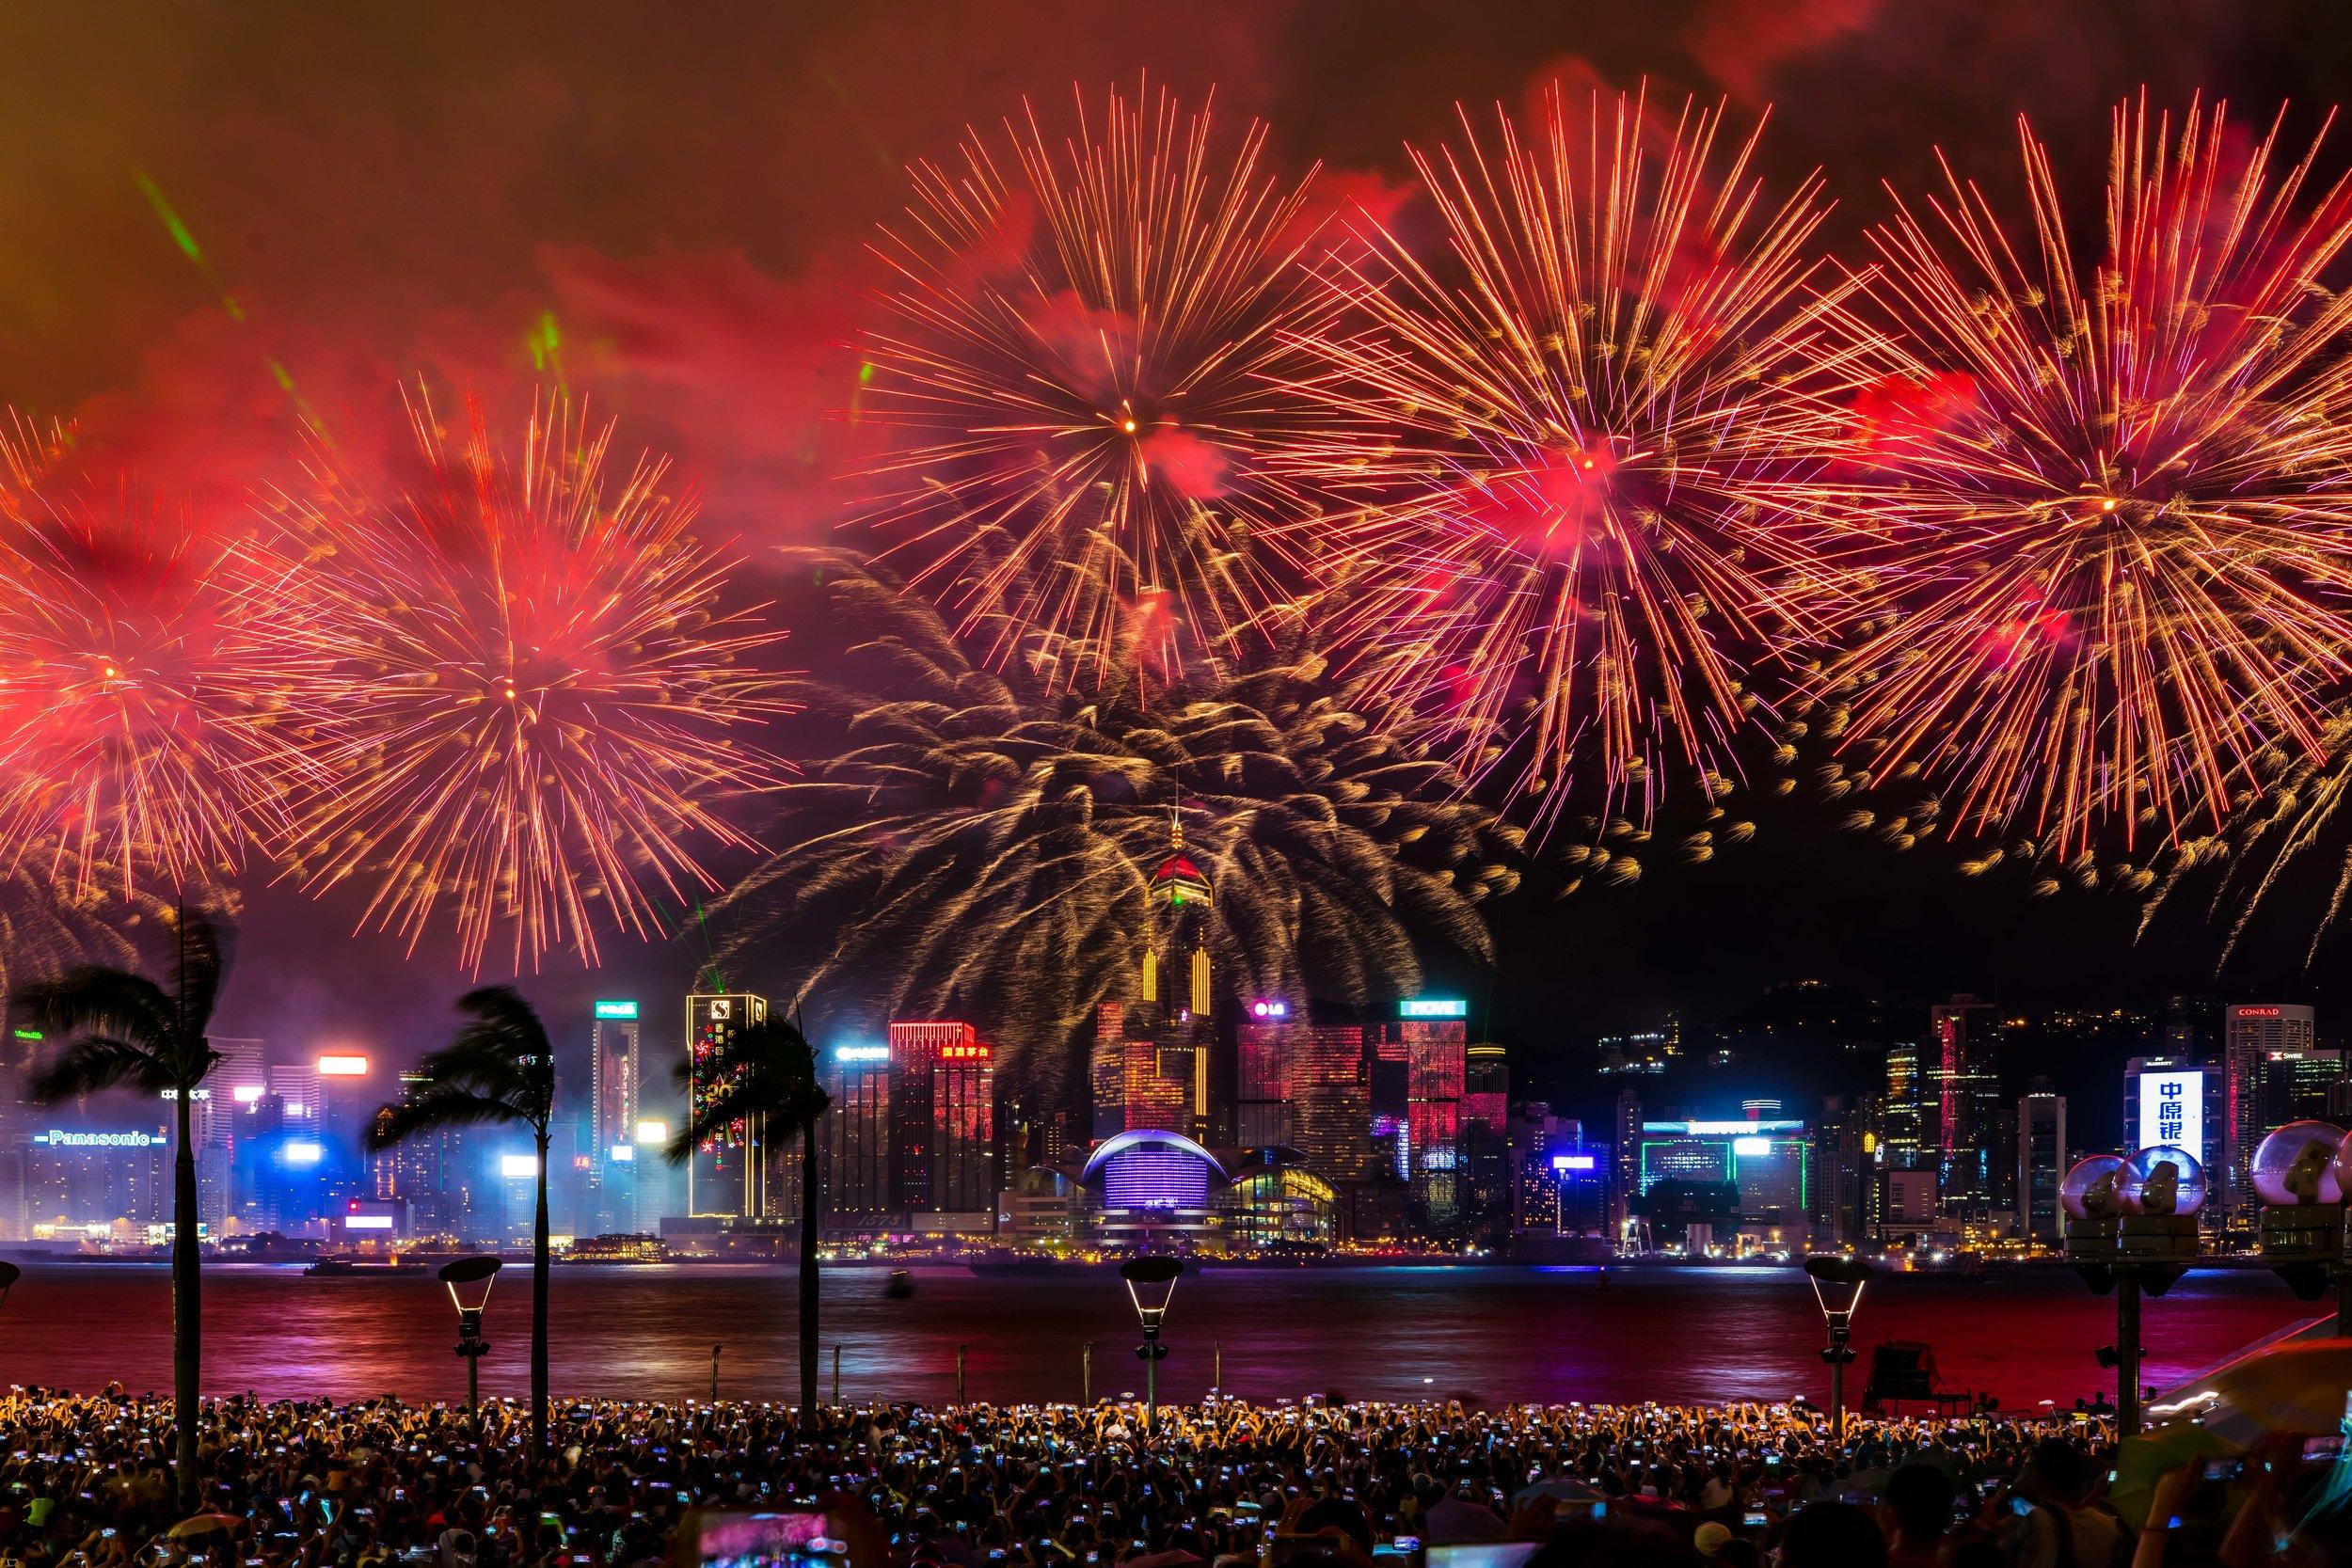 Fireworks Display 2017 #7